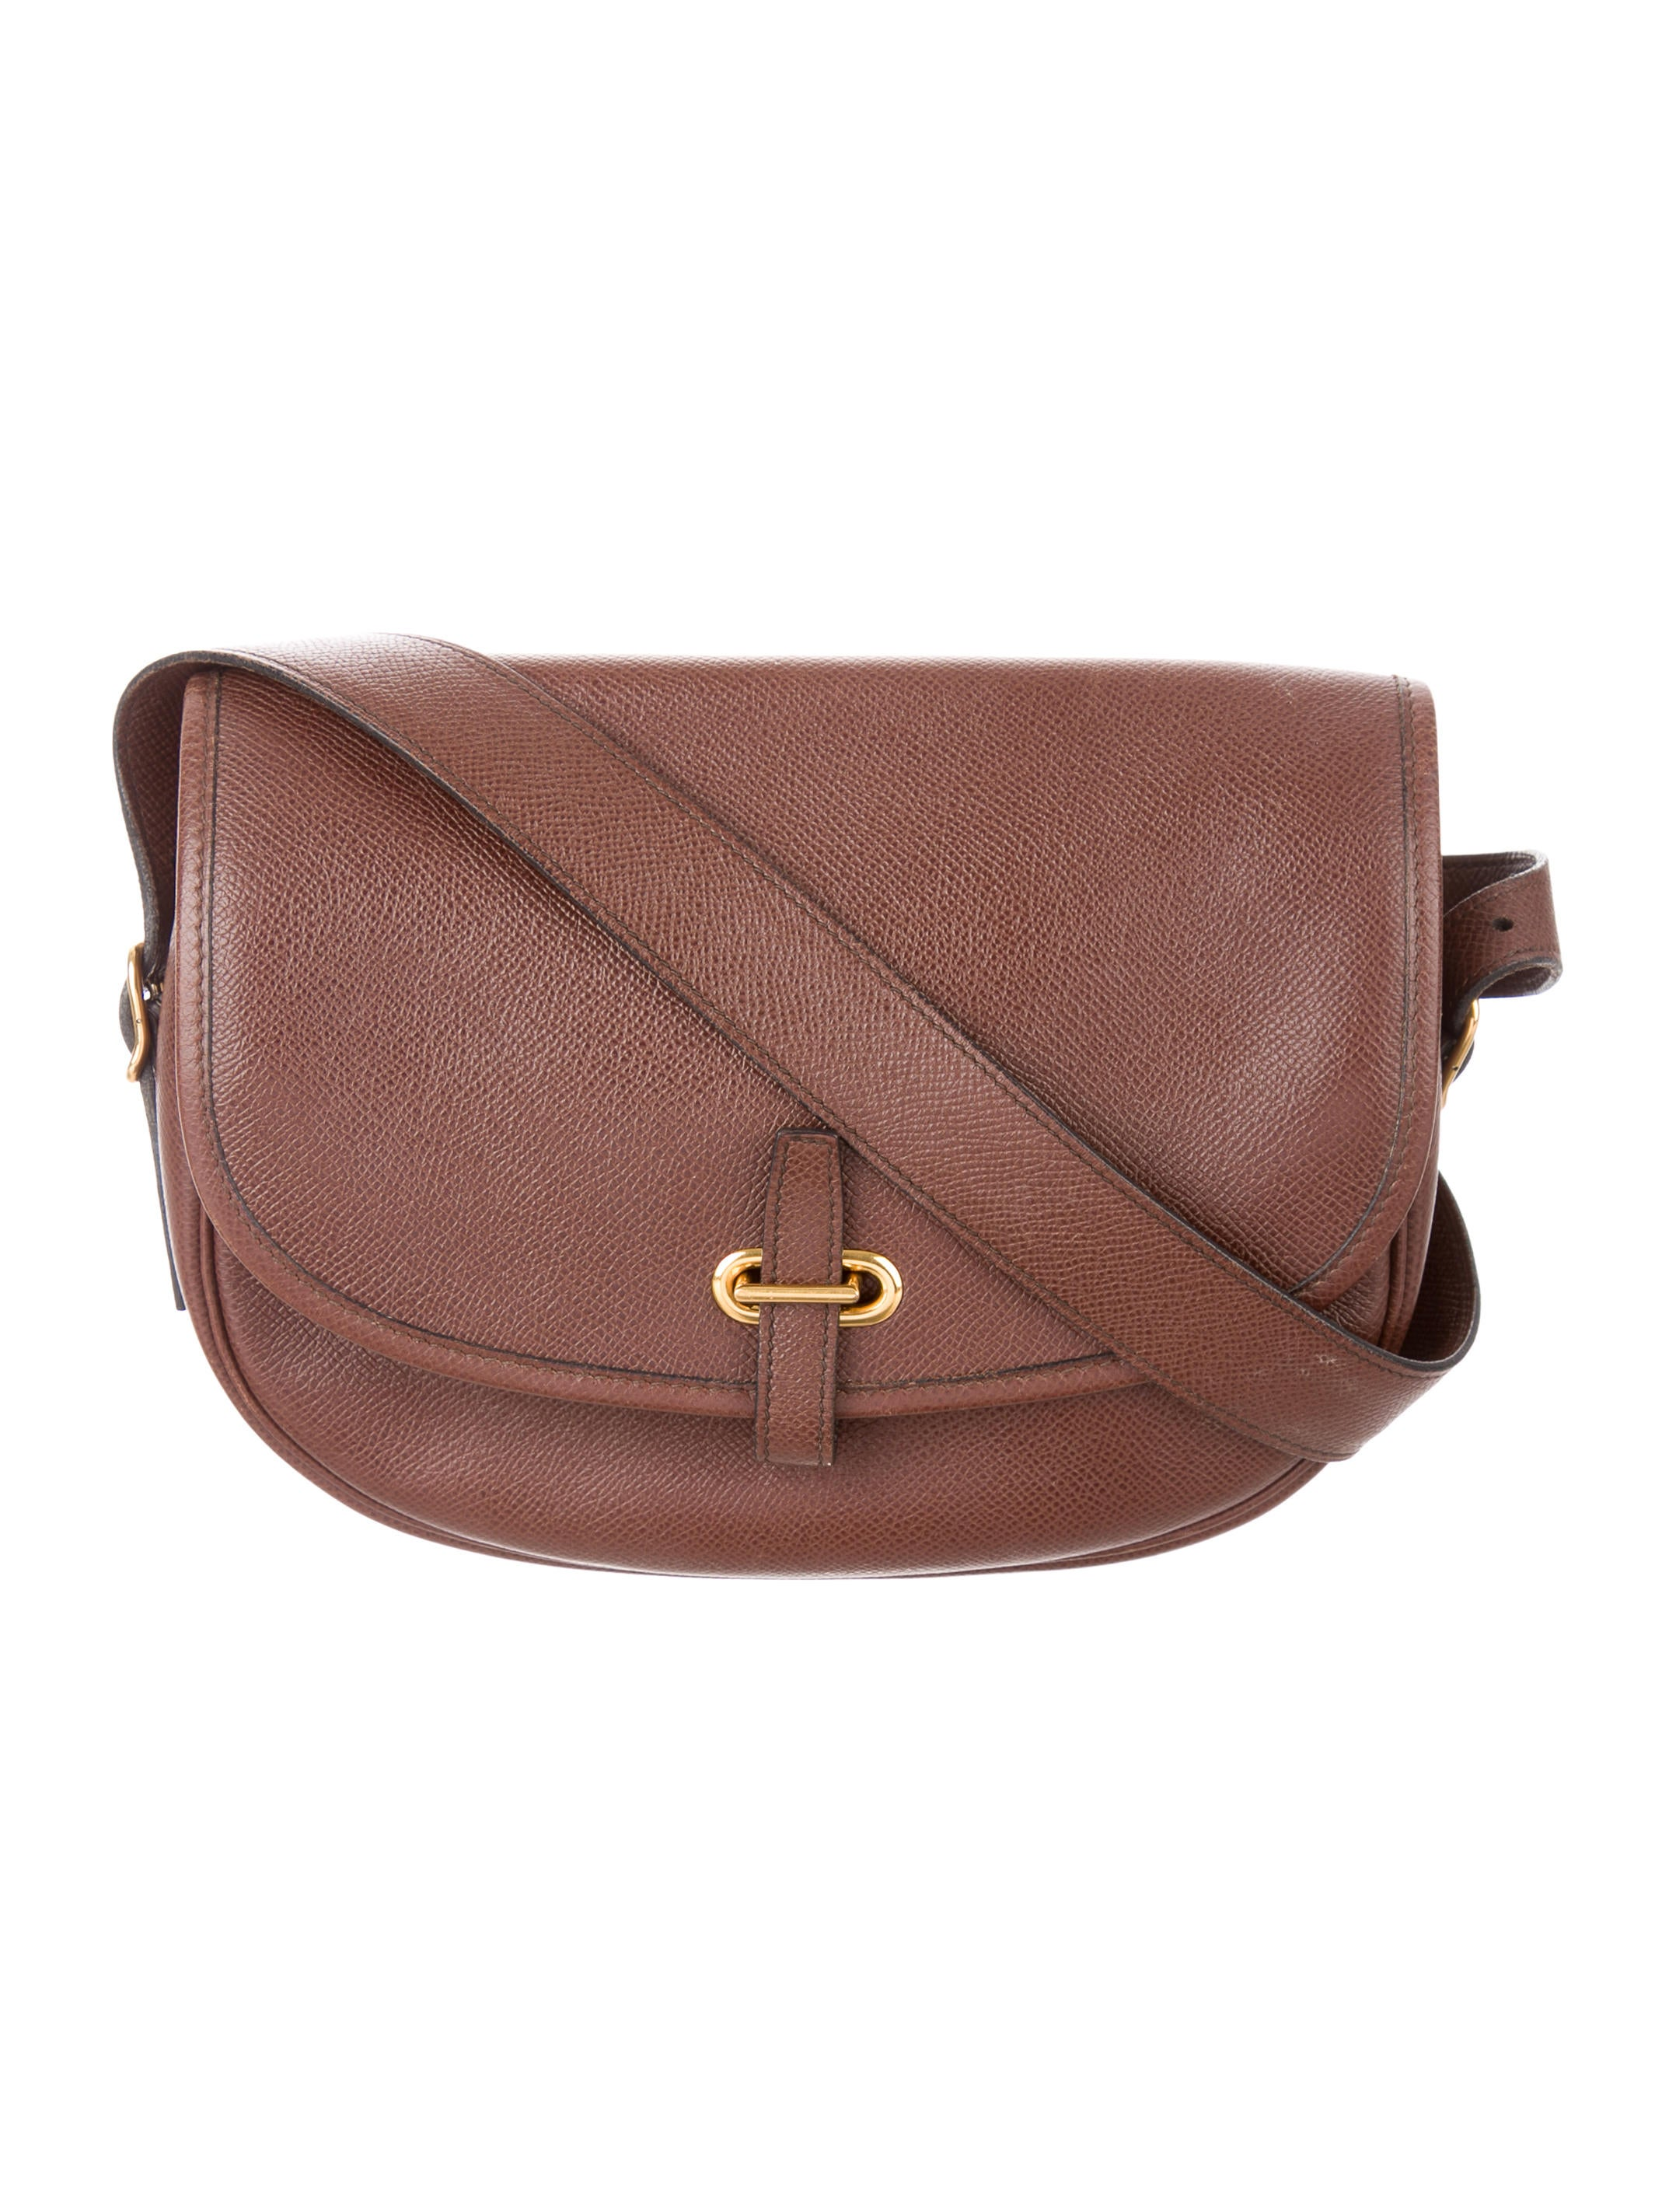 herm s balle de golf bag handbags her109276 the realreal. Black Bedroom Furniture Sets. Home Design Ideas